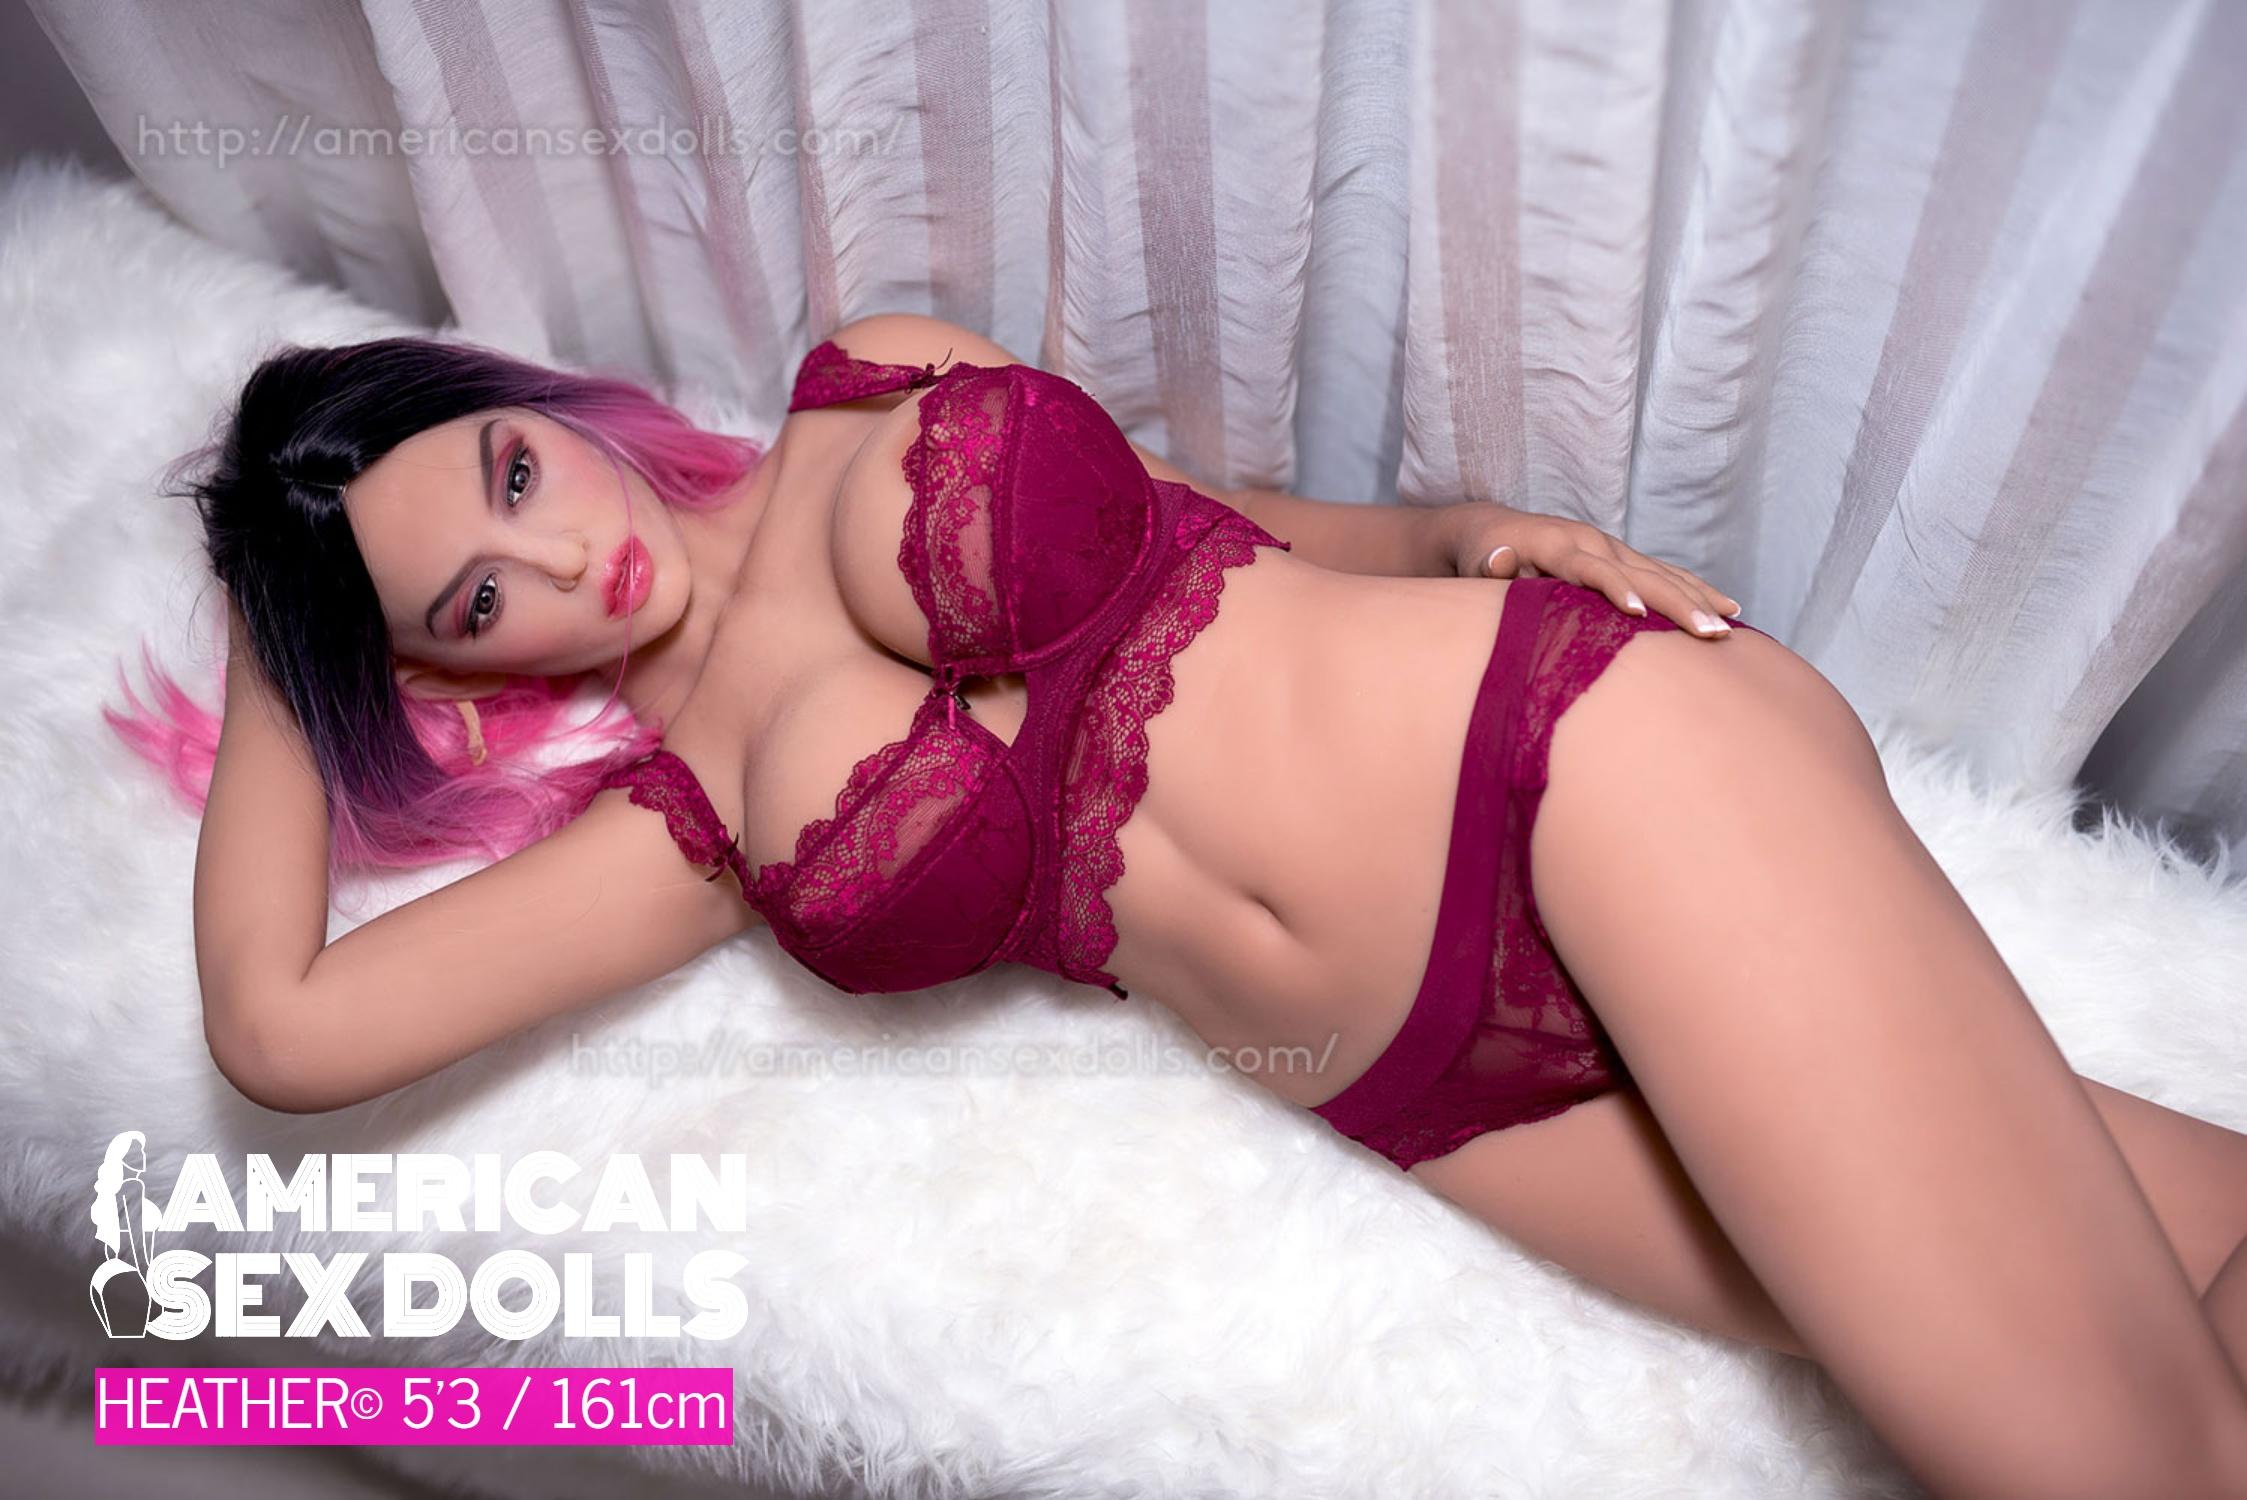 American Sex Dolls 6Ye Premium 161cm 33 (11).jpg